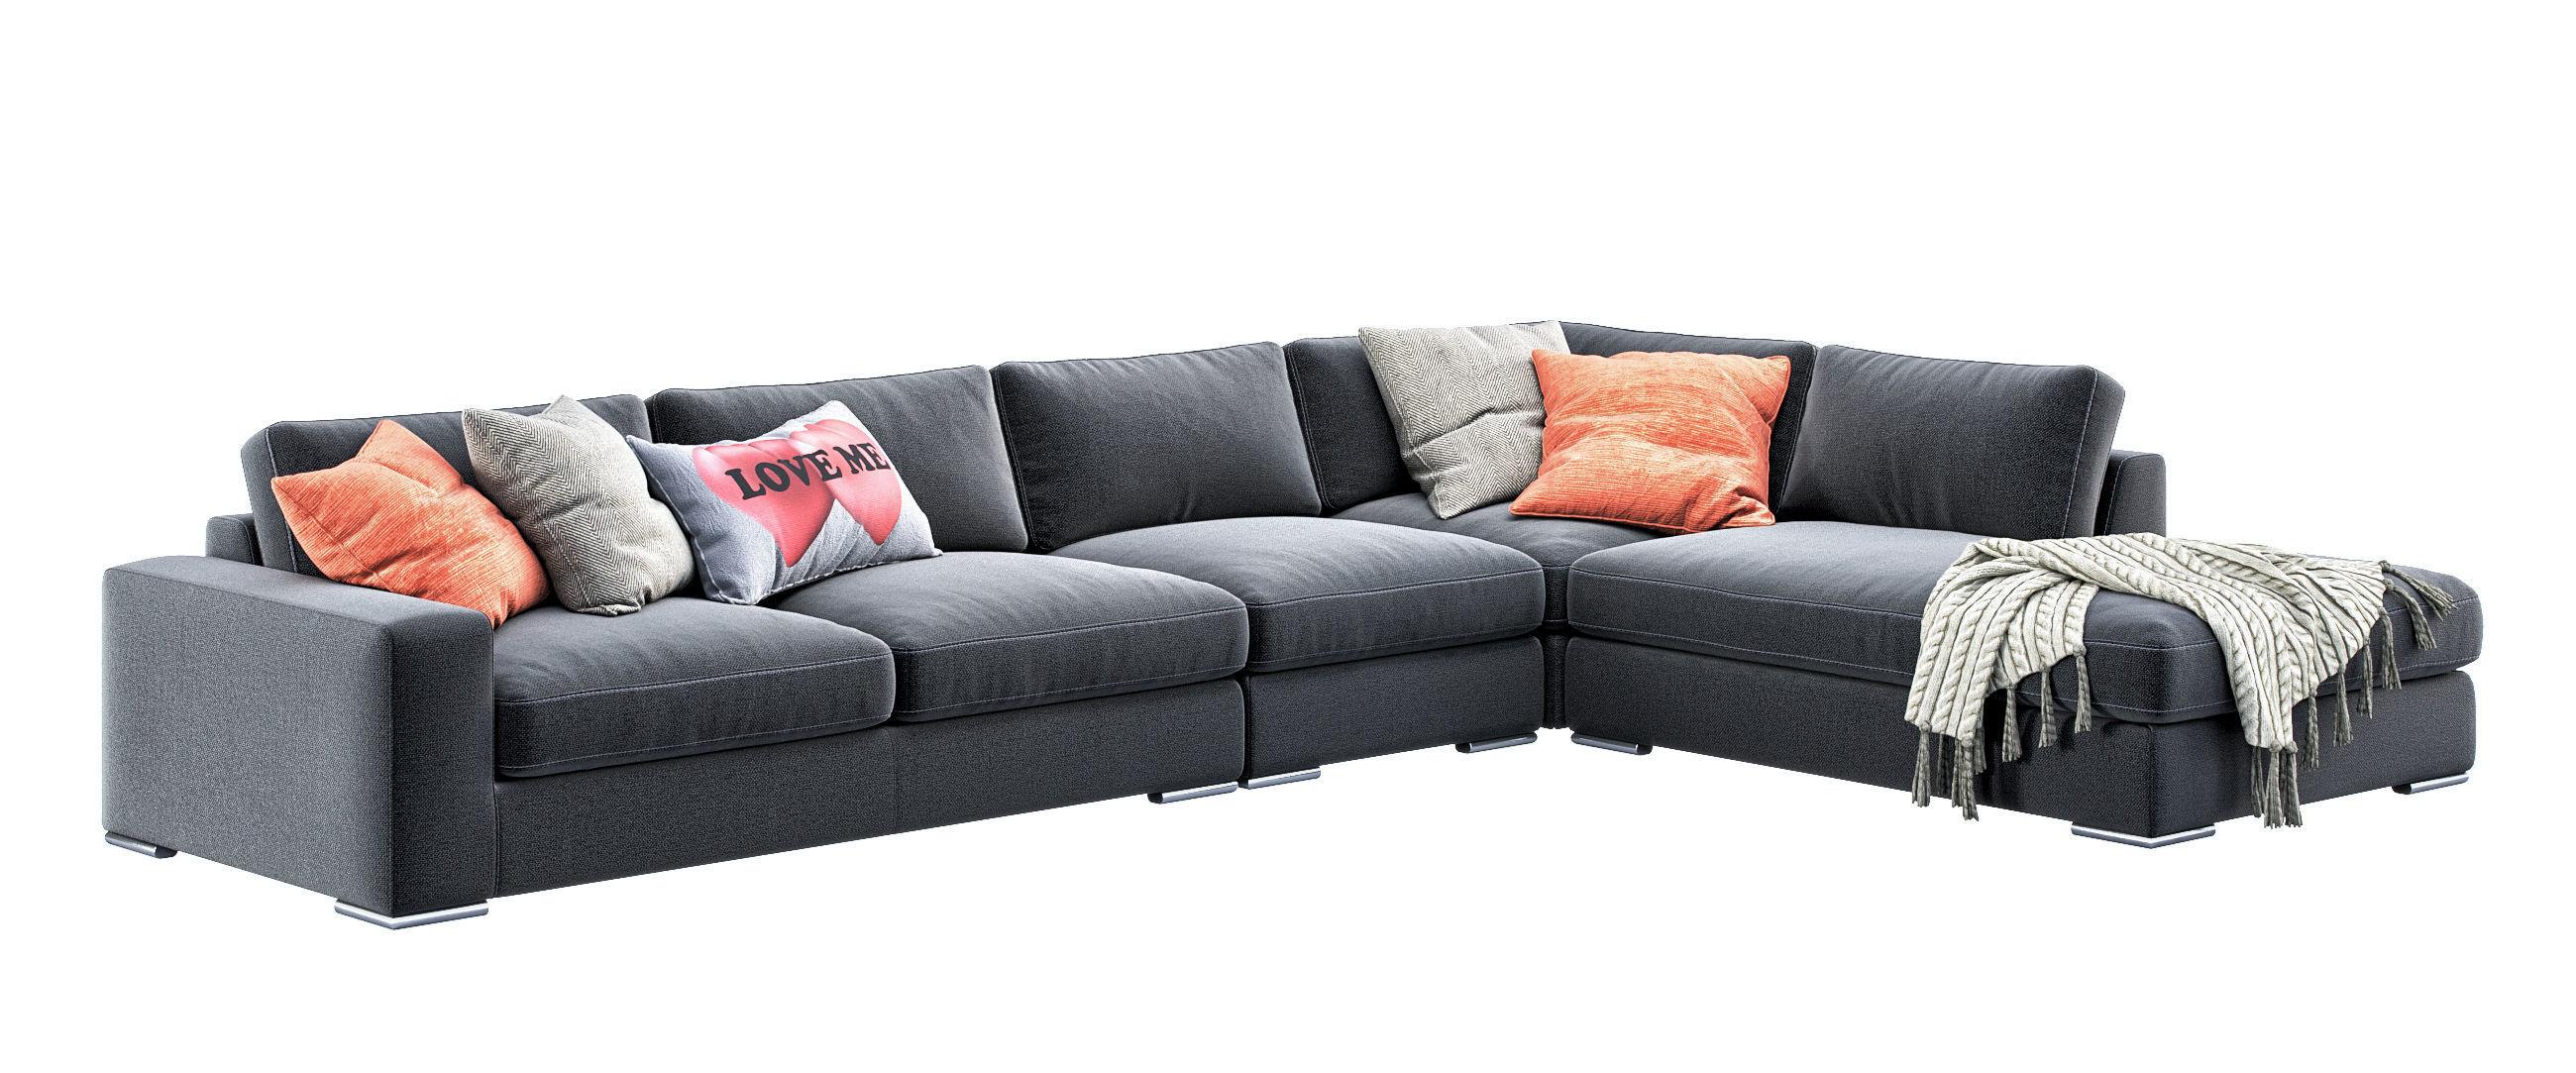 sofa Max from CAVA factory